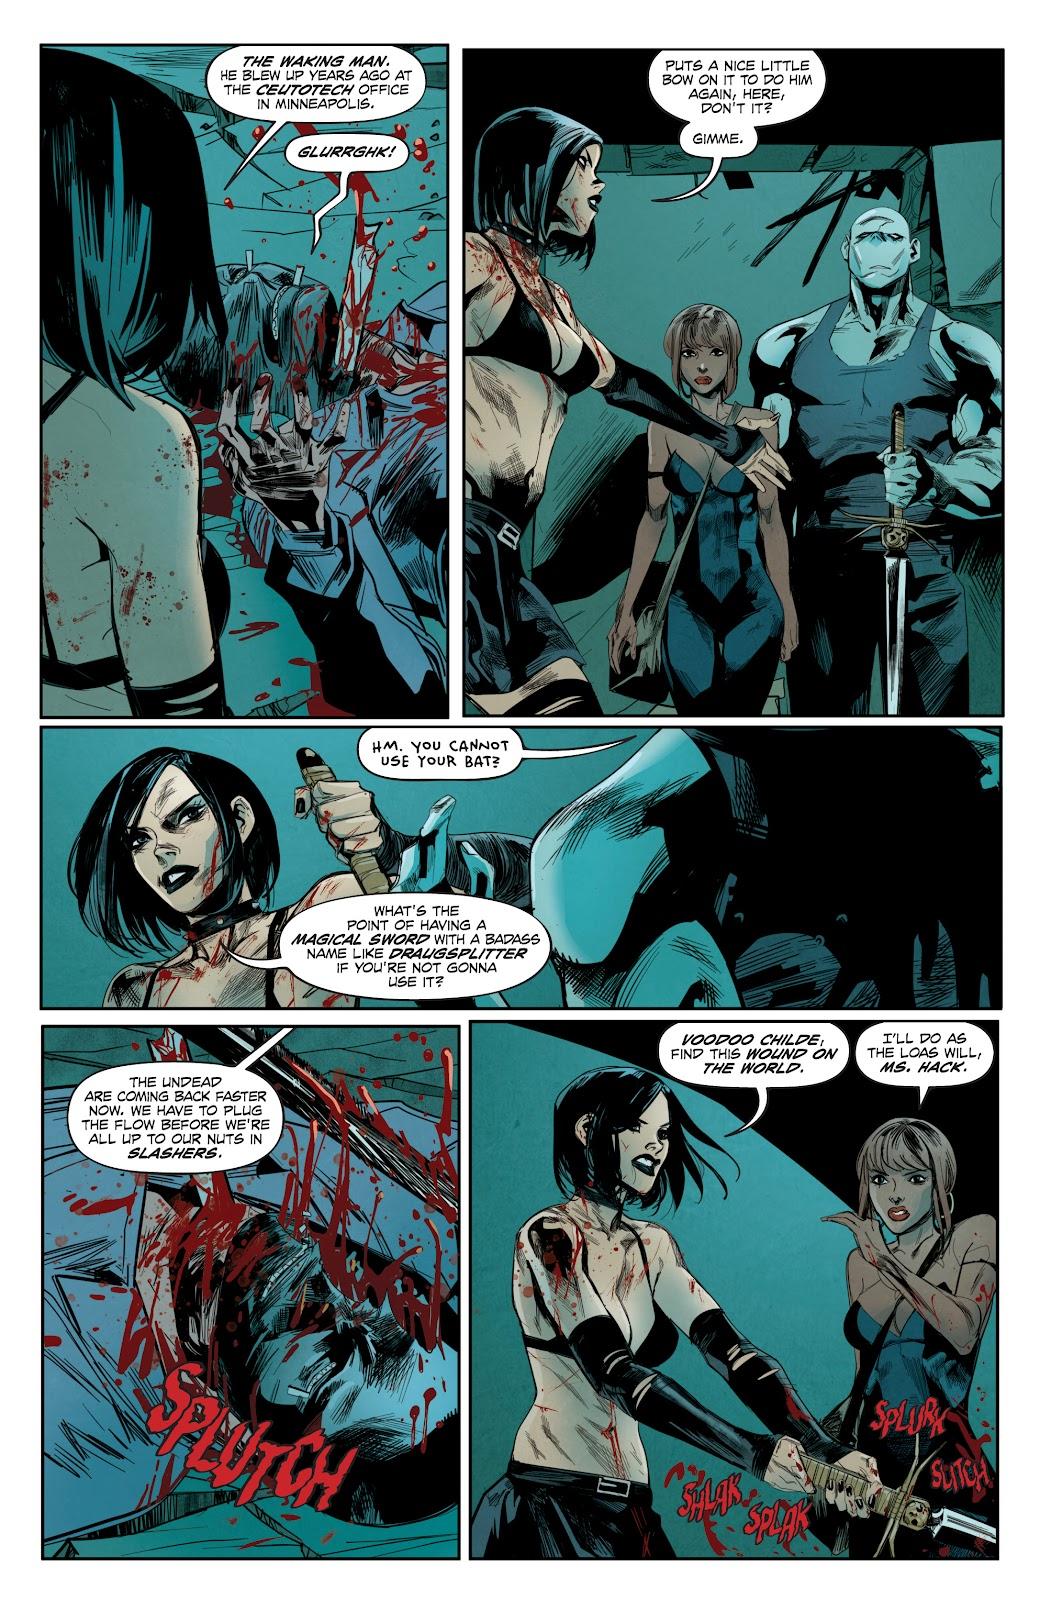 Read online Hack/Slash vs. Chaos comic -  Issue #3 - 7